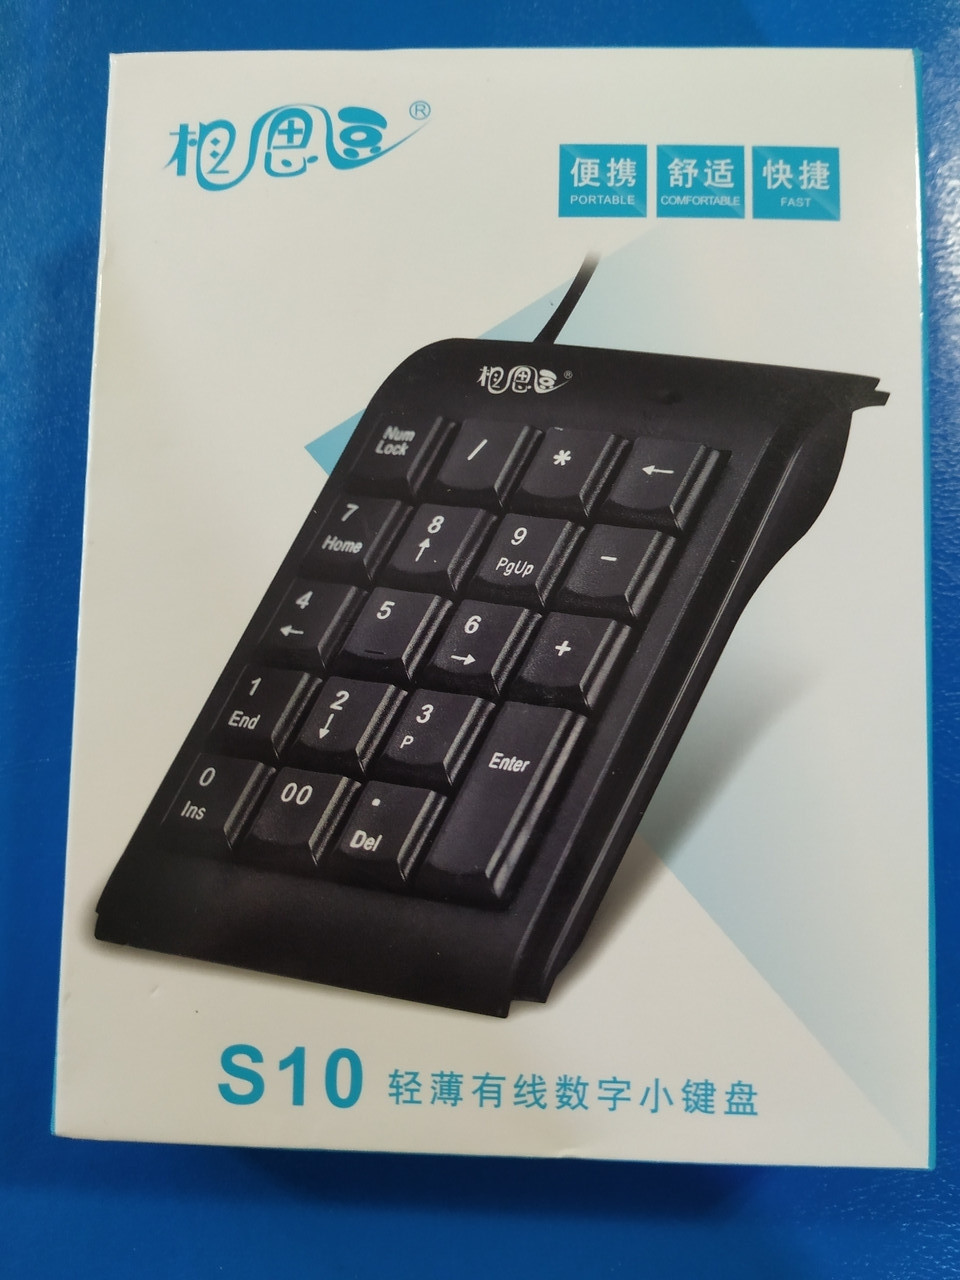 Клавиатура цифровая для компьютера 19 клавиш, Алматы